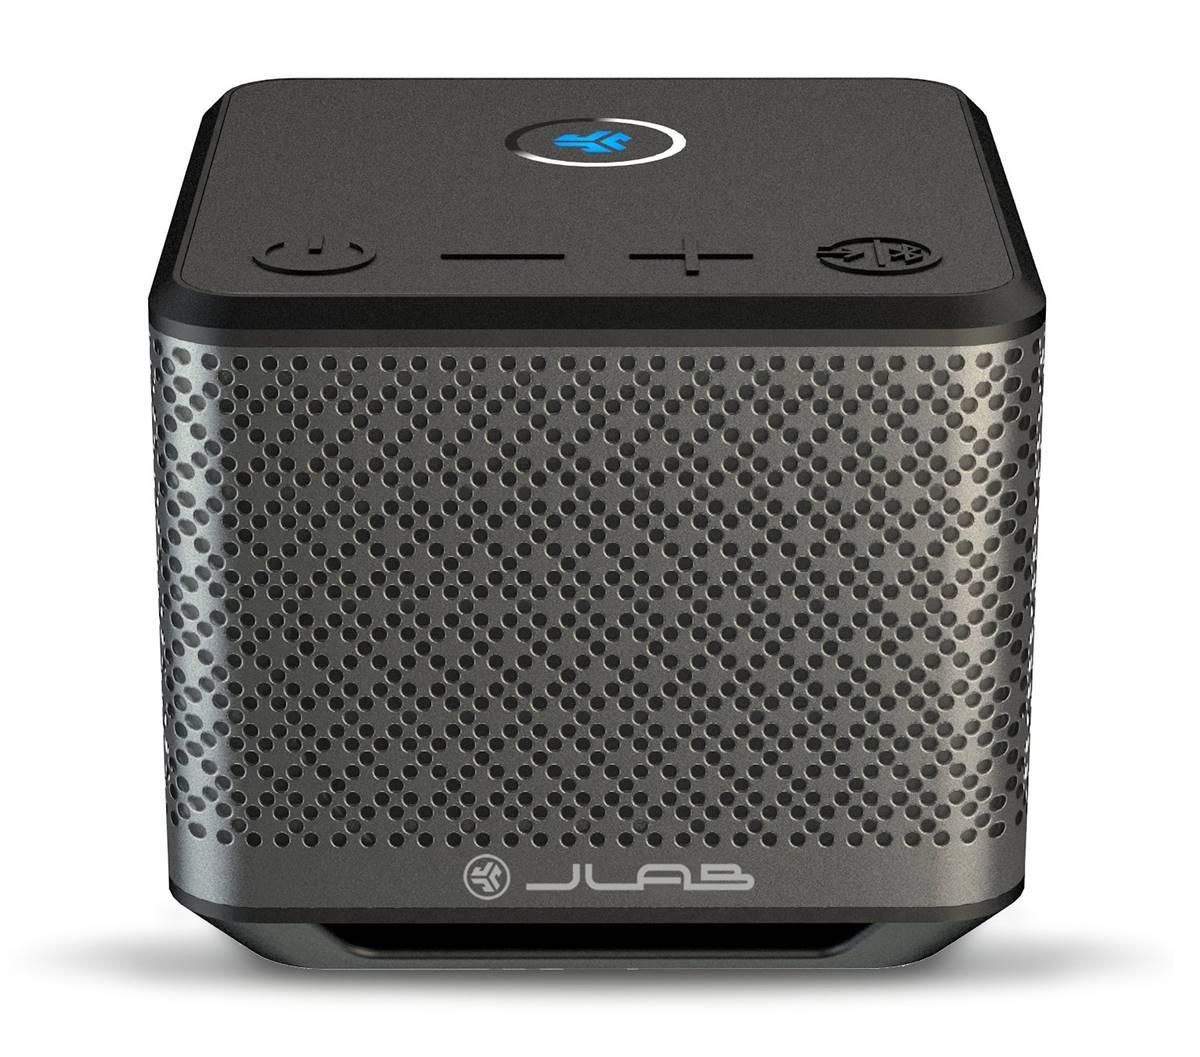 JLab Audio House Mutli-Room Speaker System